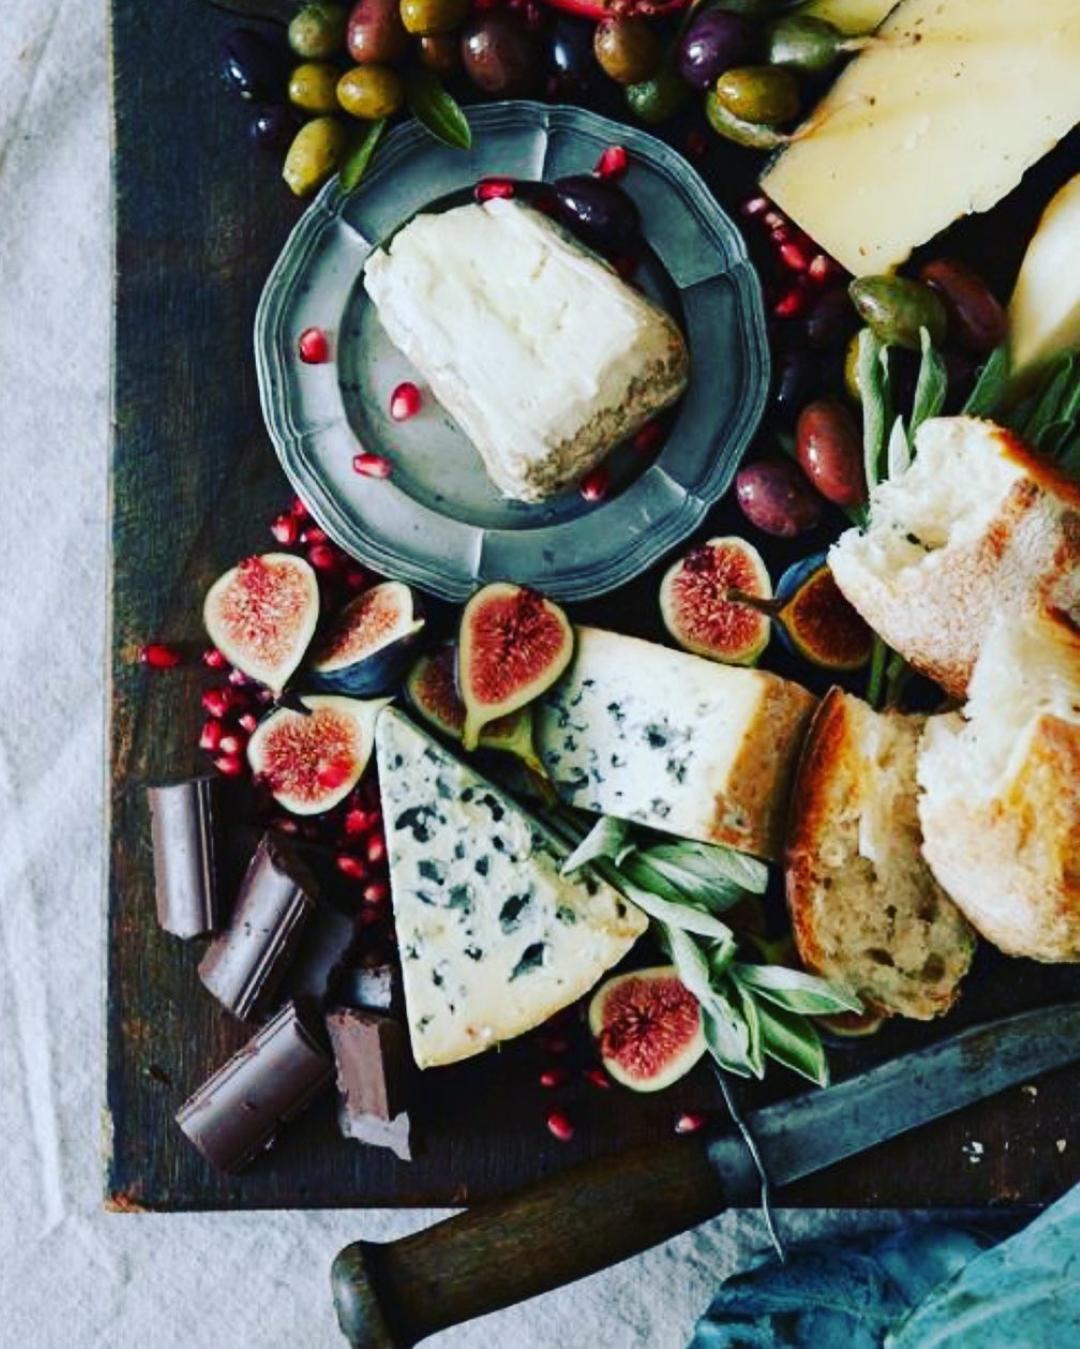 yallingup cheese co